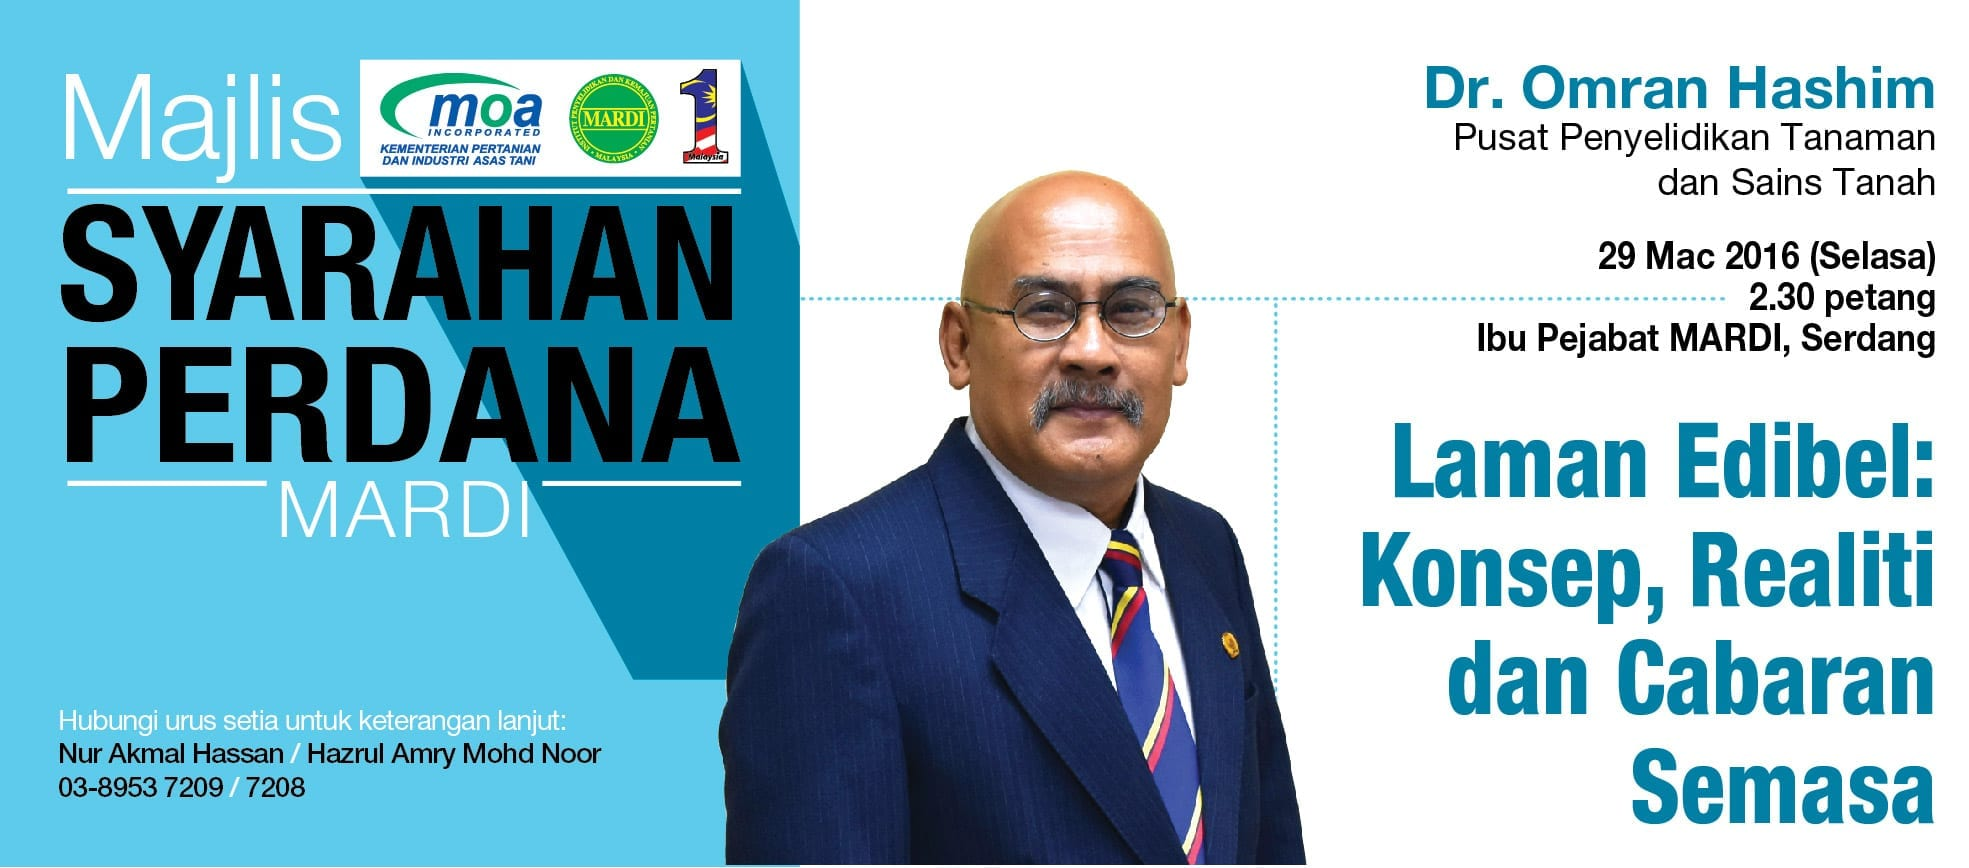 Banner Syarahan Perdana MARDI - Dr. Omran Hashim